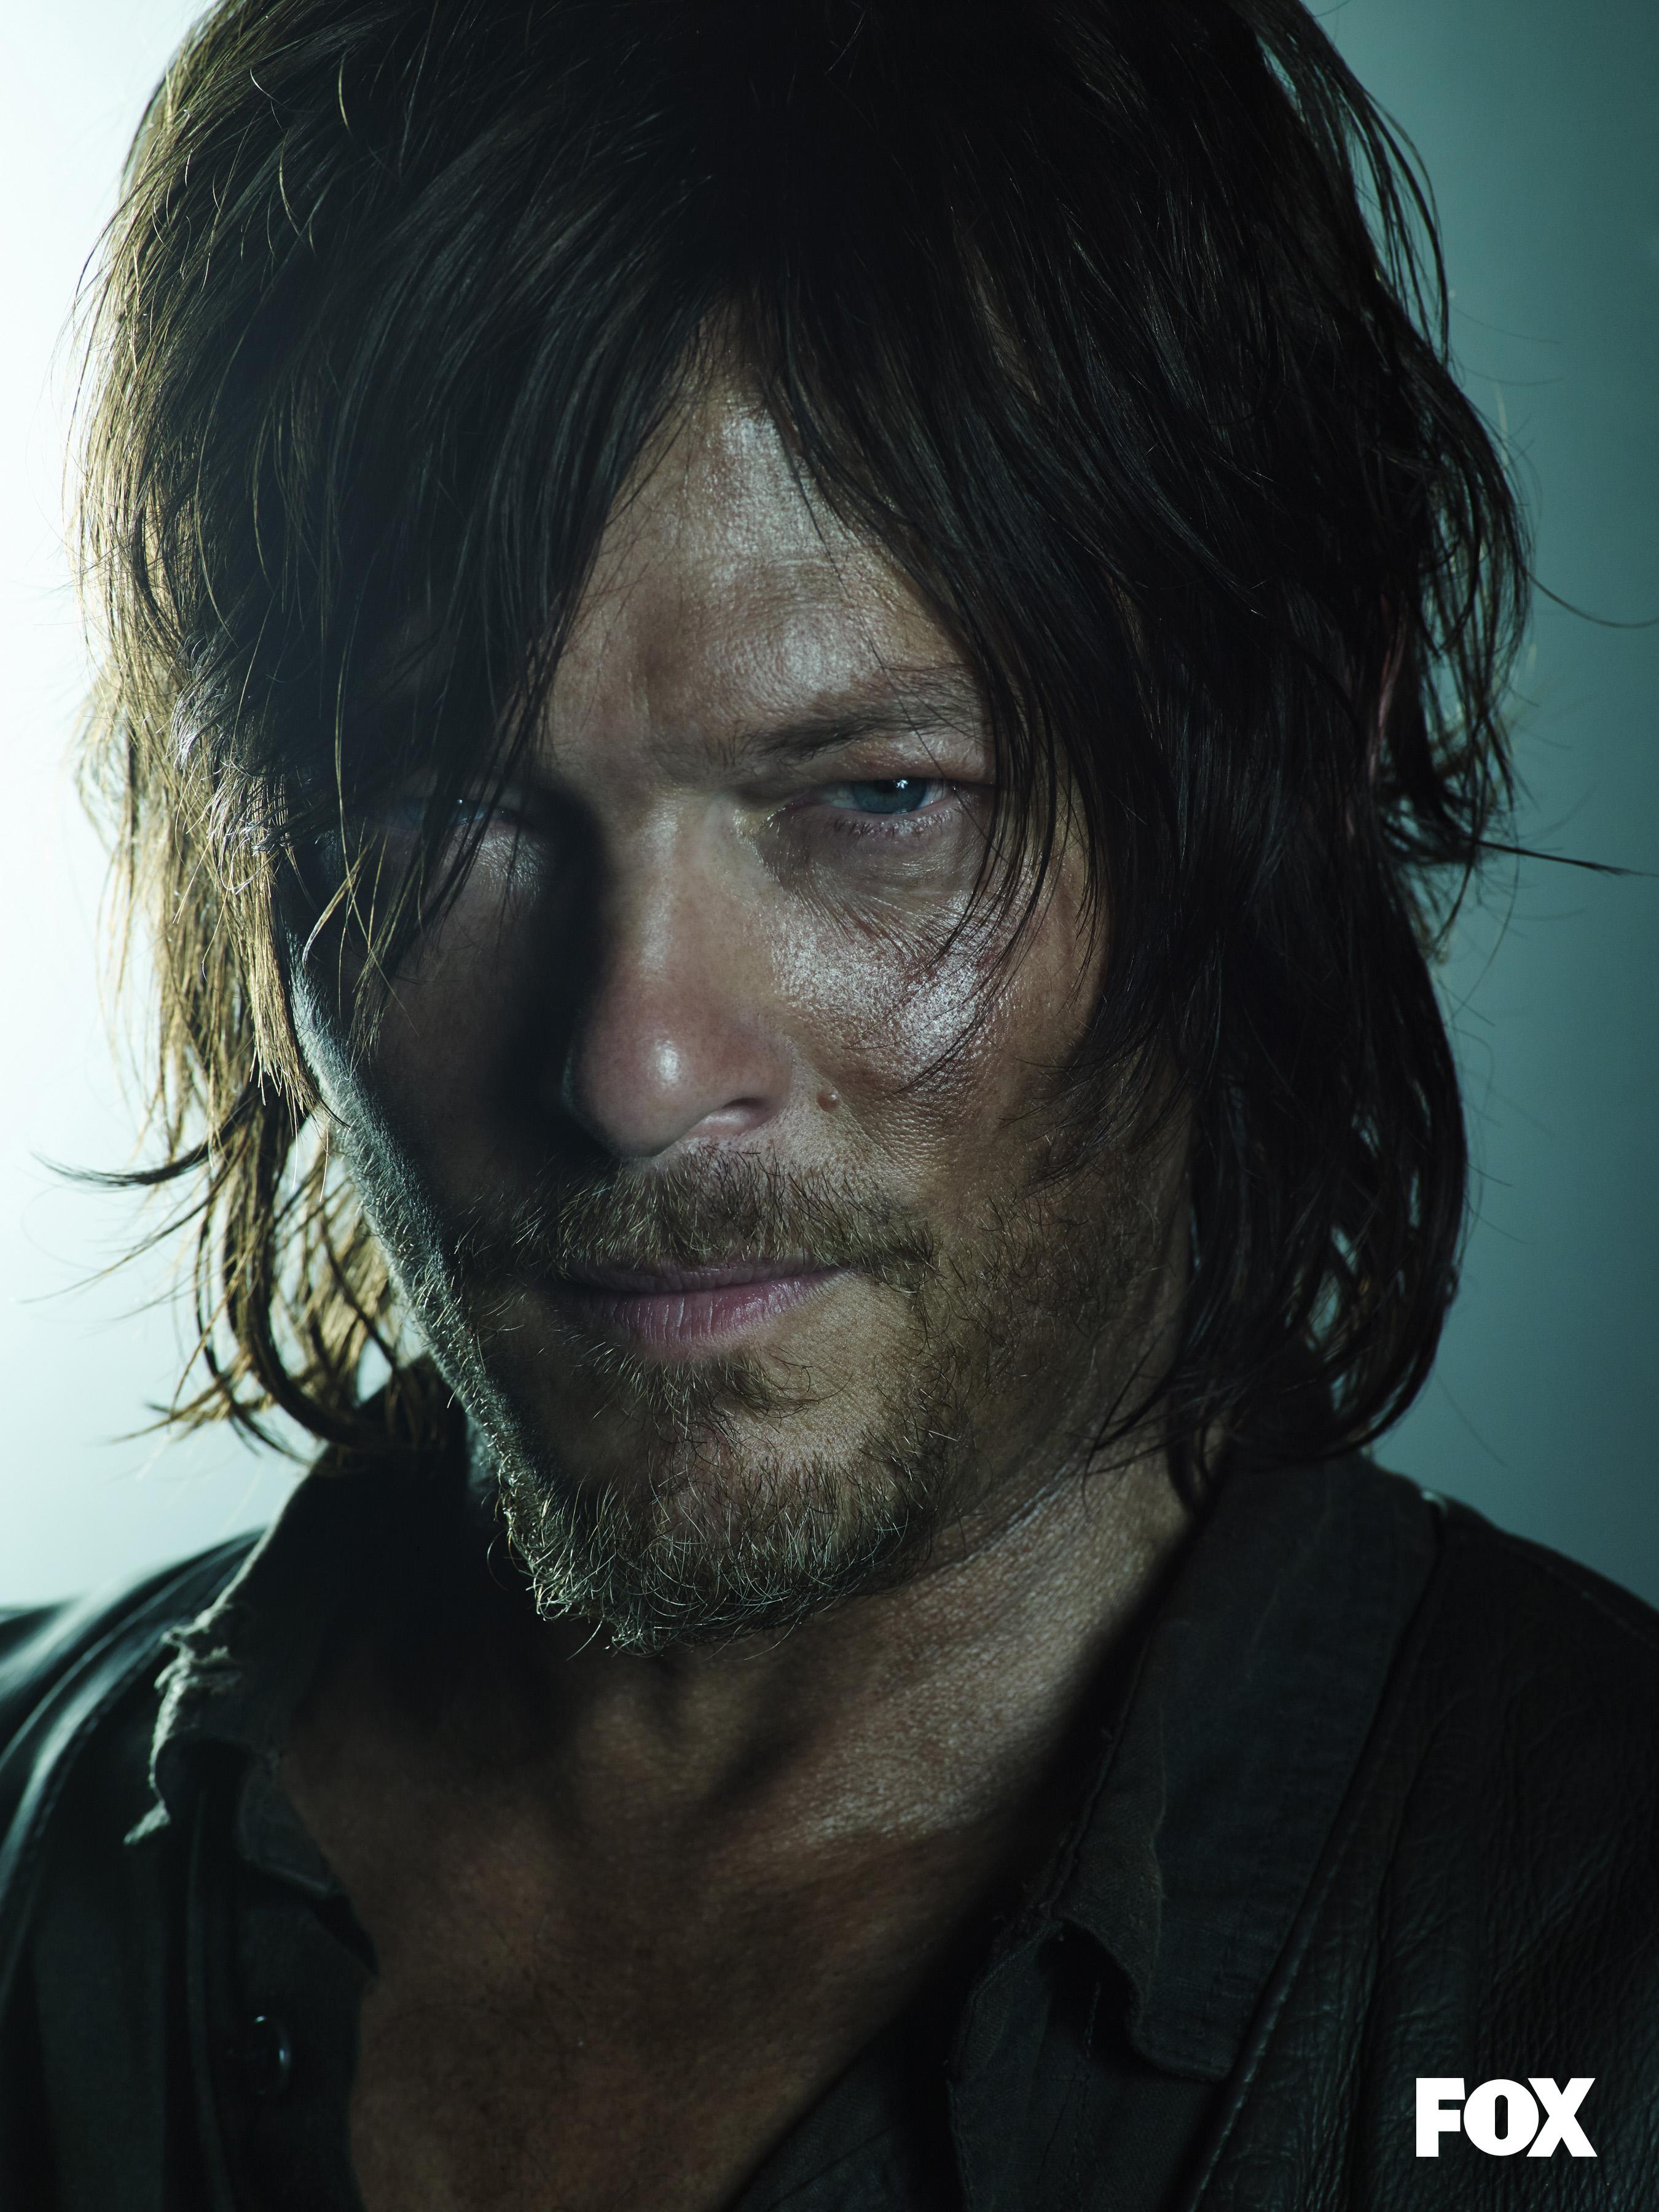 AMC_TWD_Daryl_Portraits_4726_V1